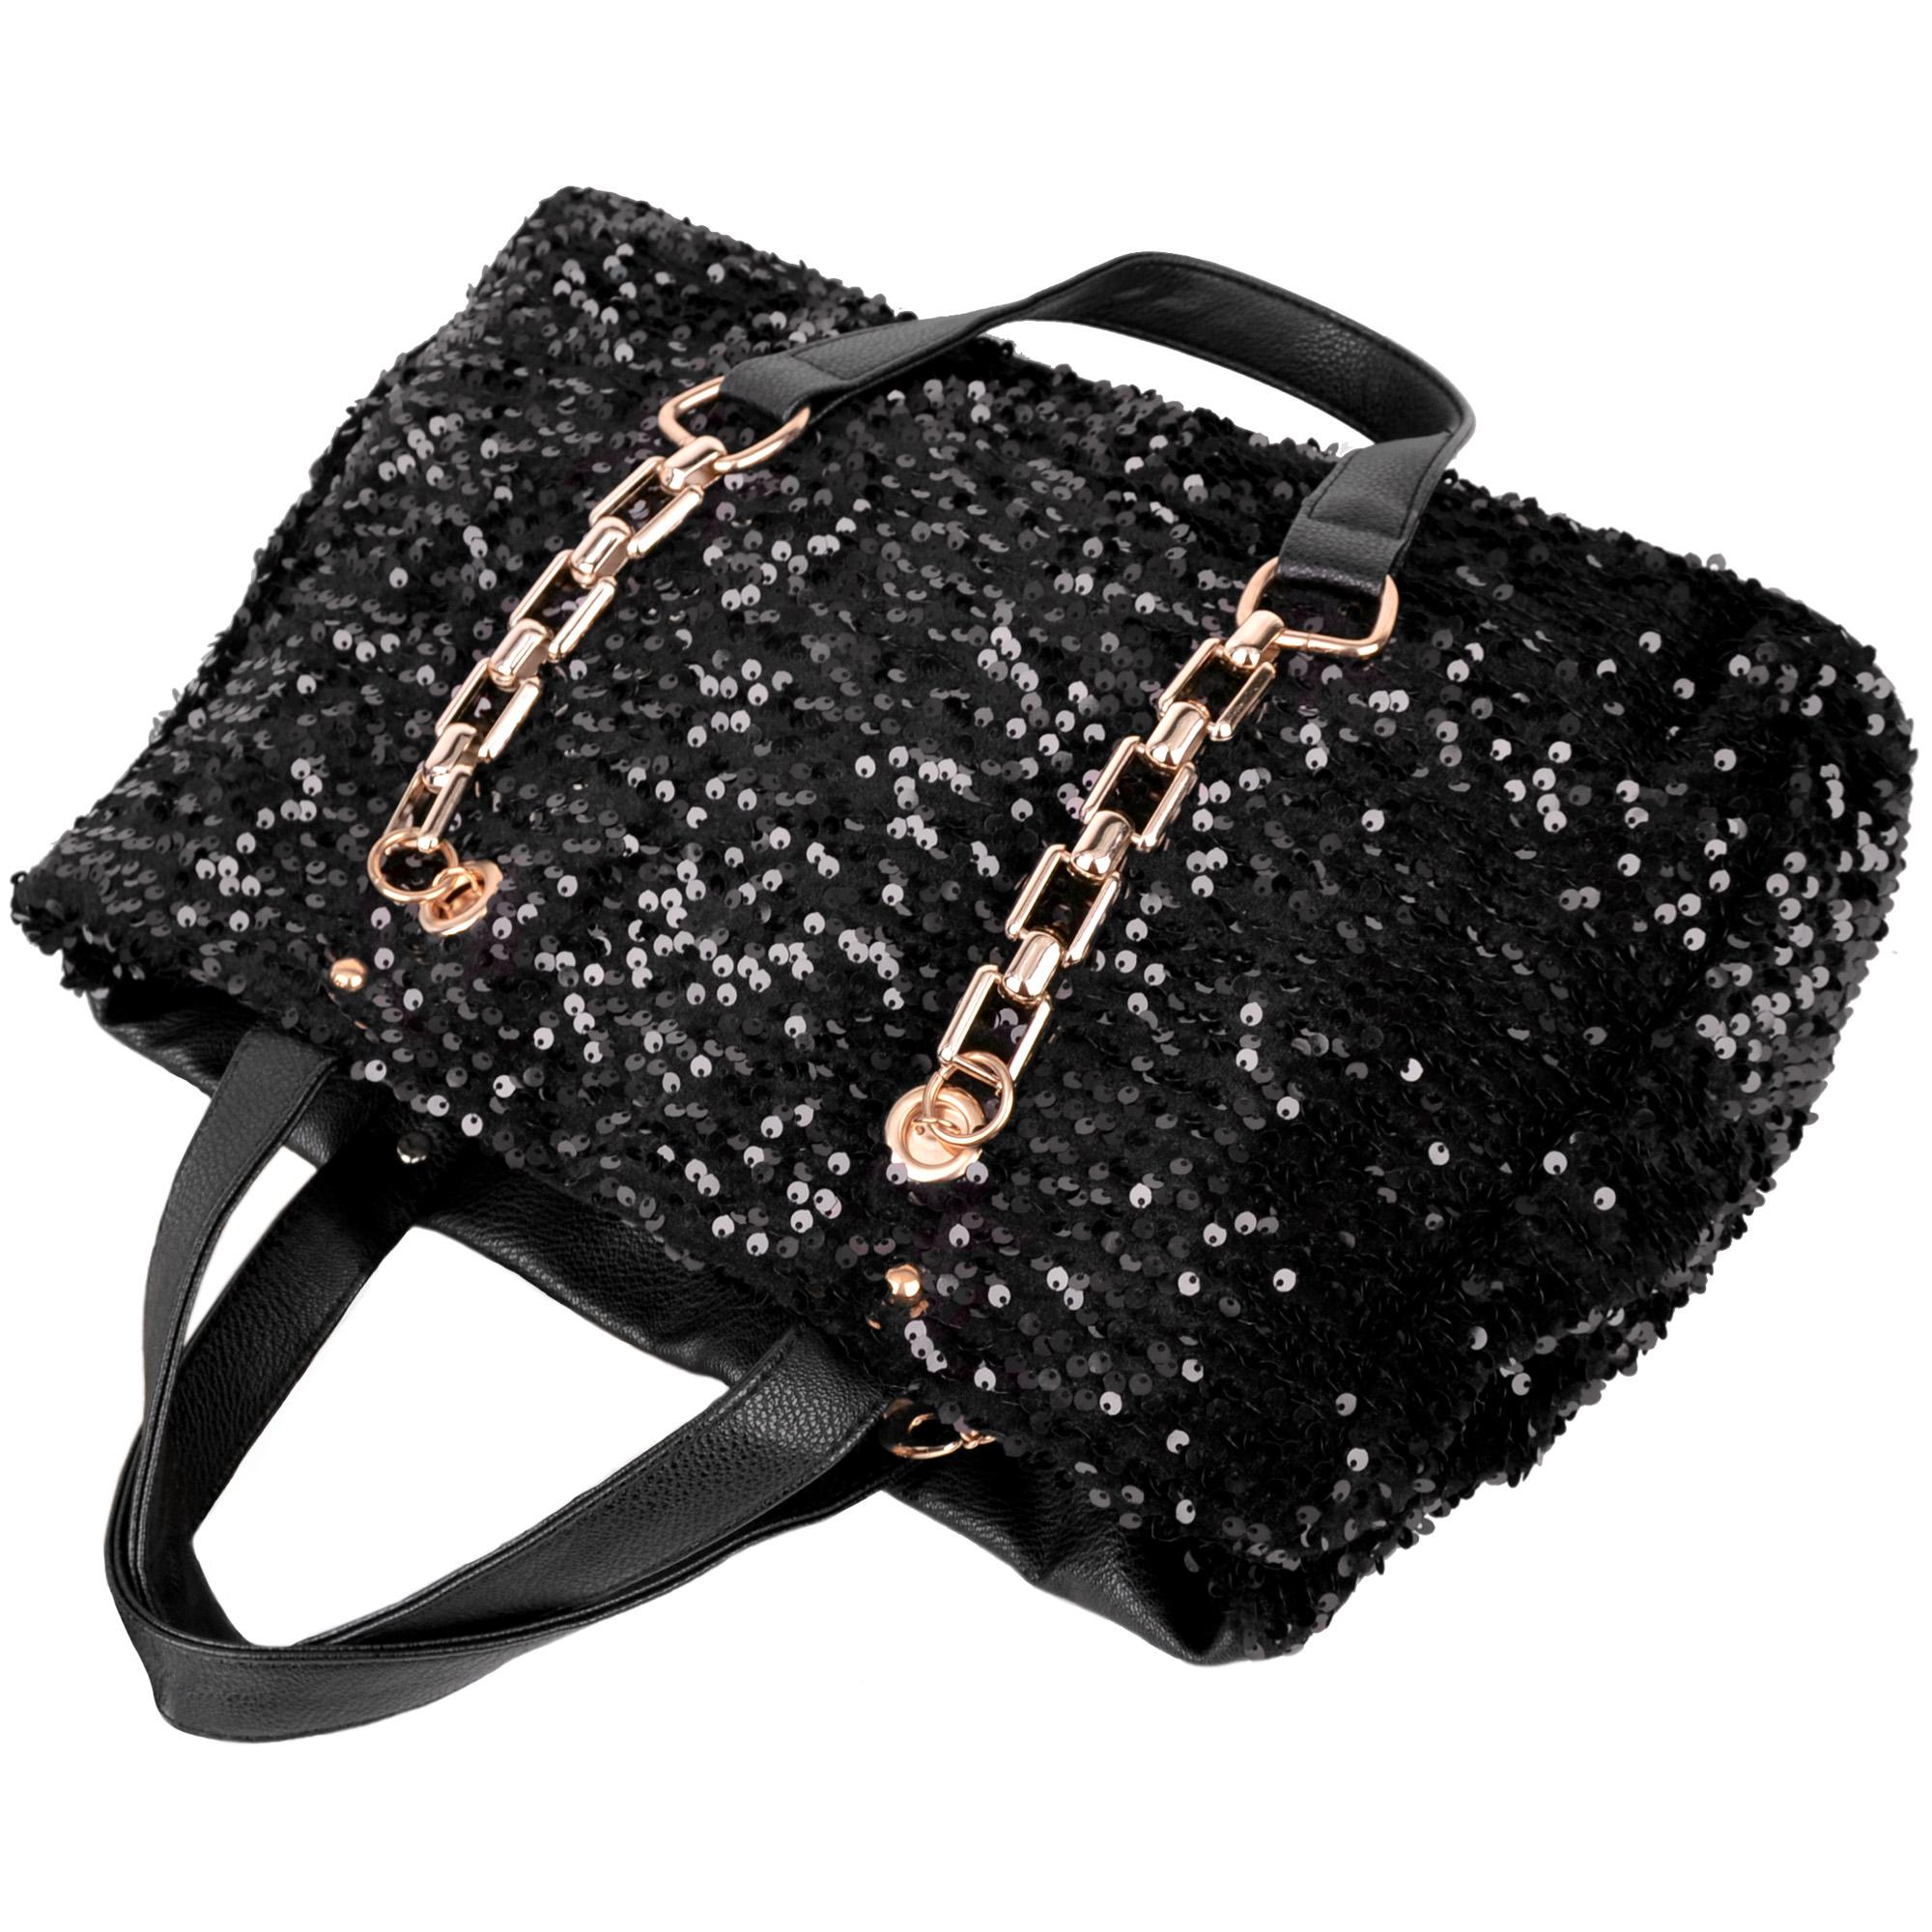 Noelia black sequined handbag top image